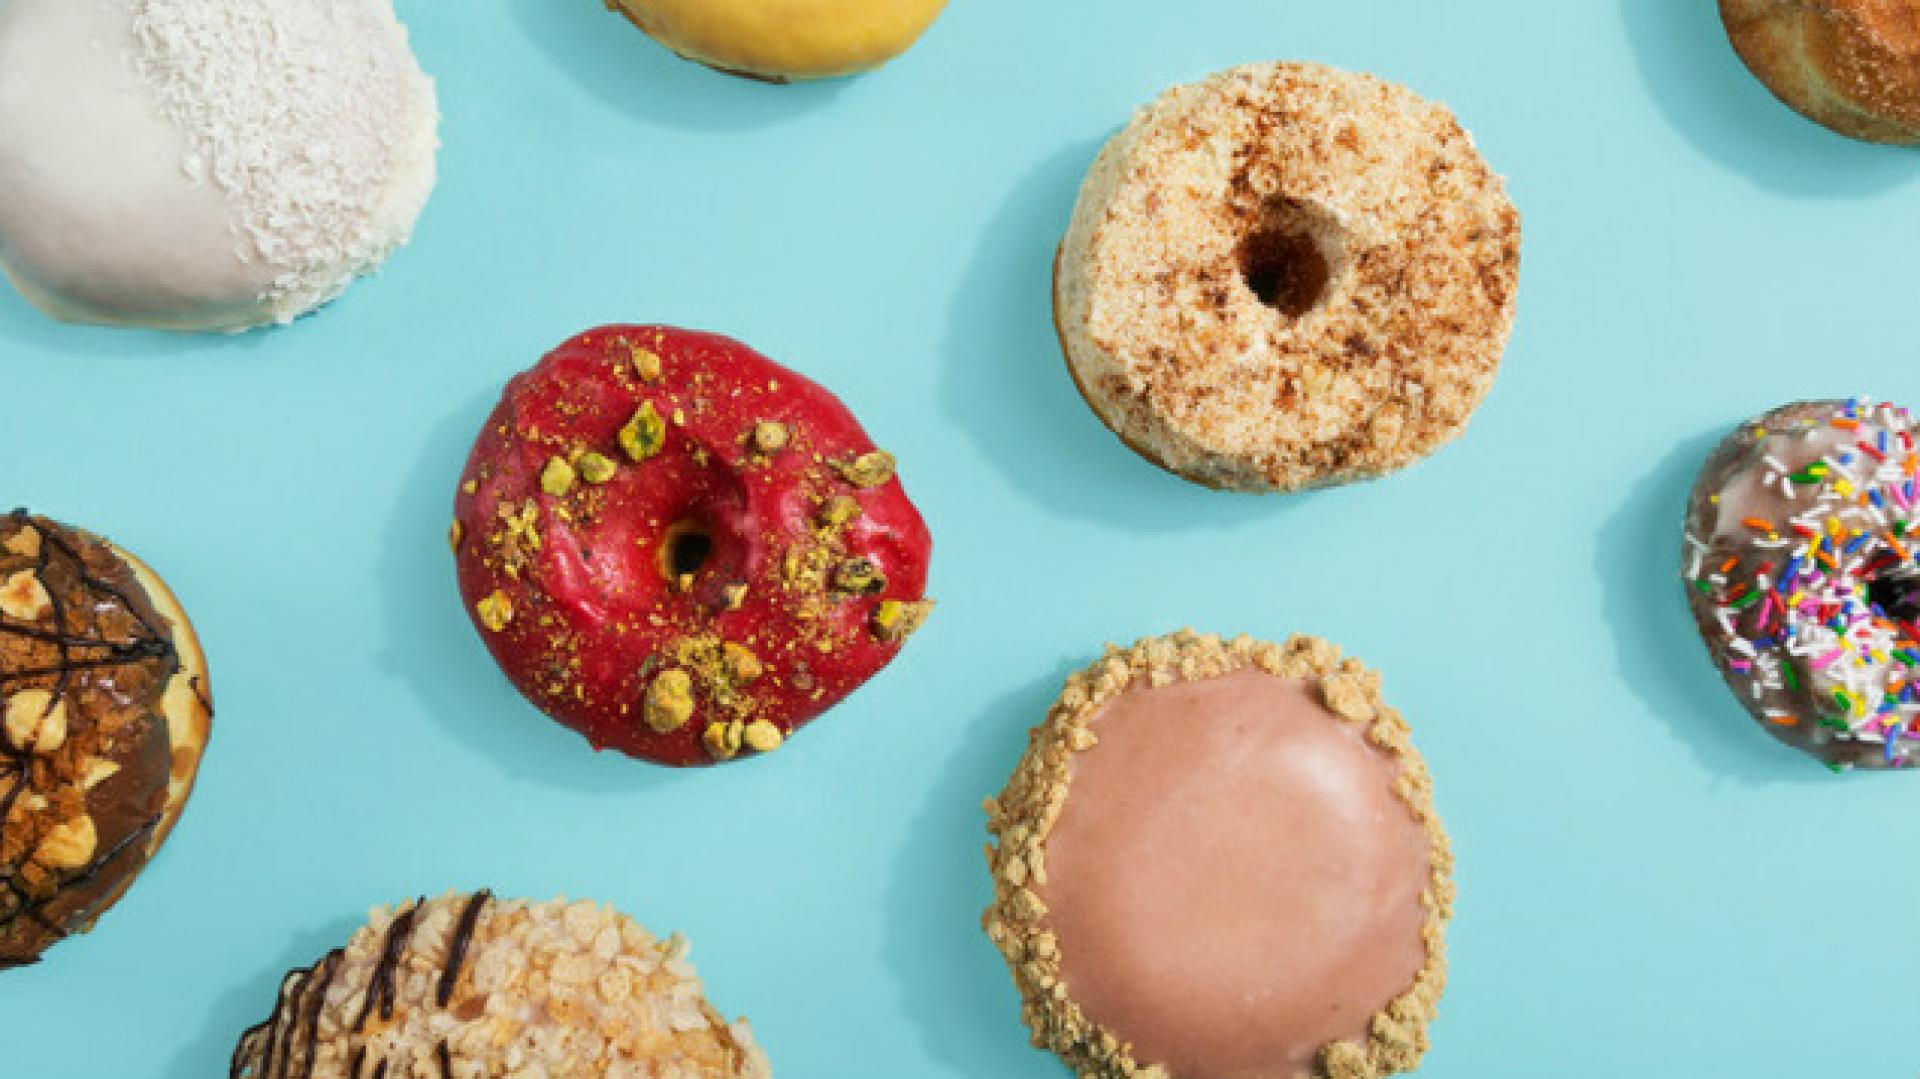 Best doughnuts in Toronto: Glory Hole doughnuts